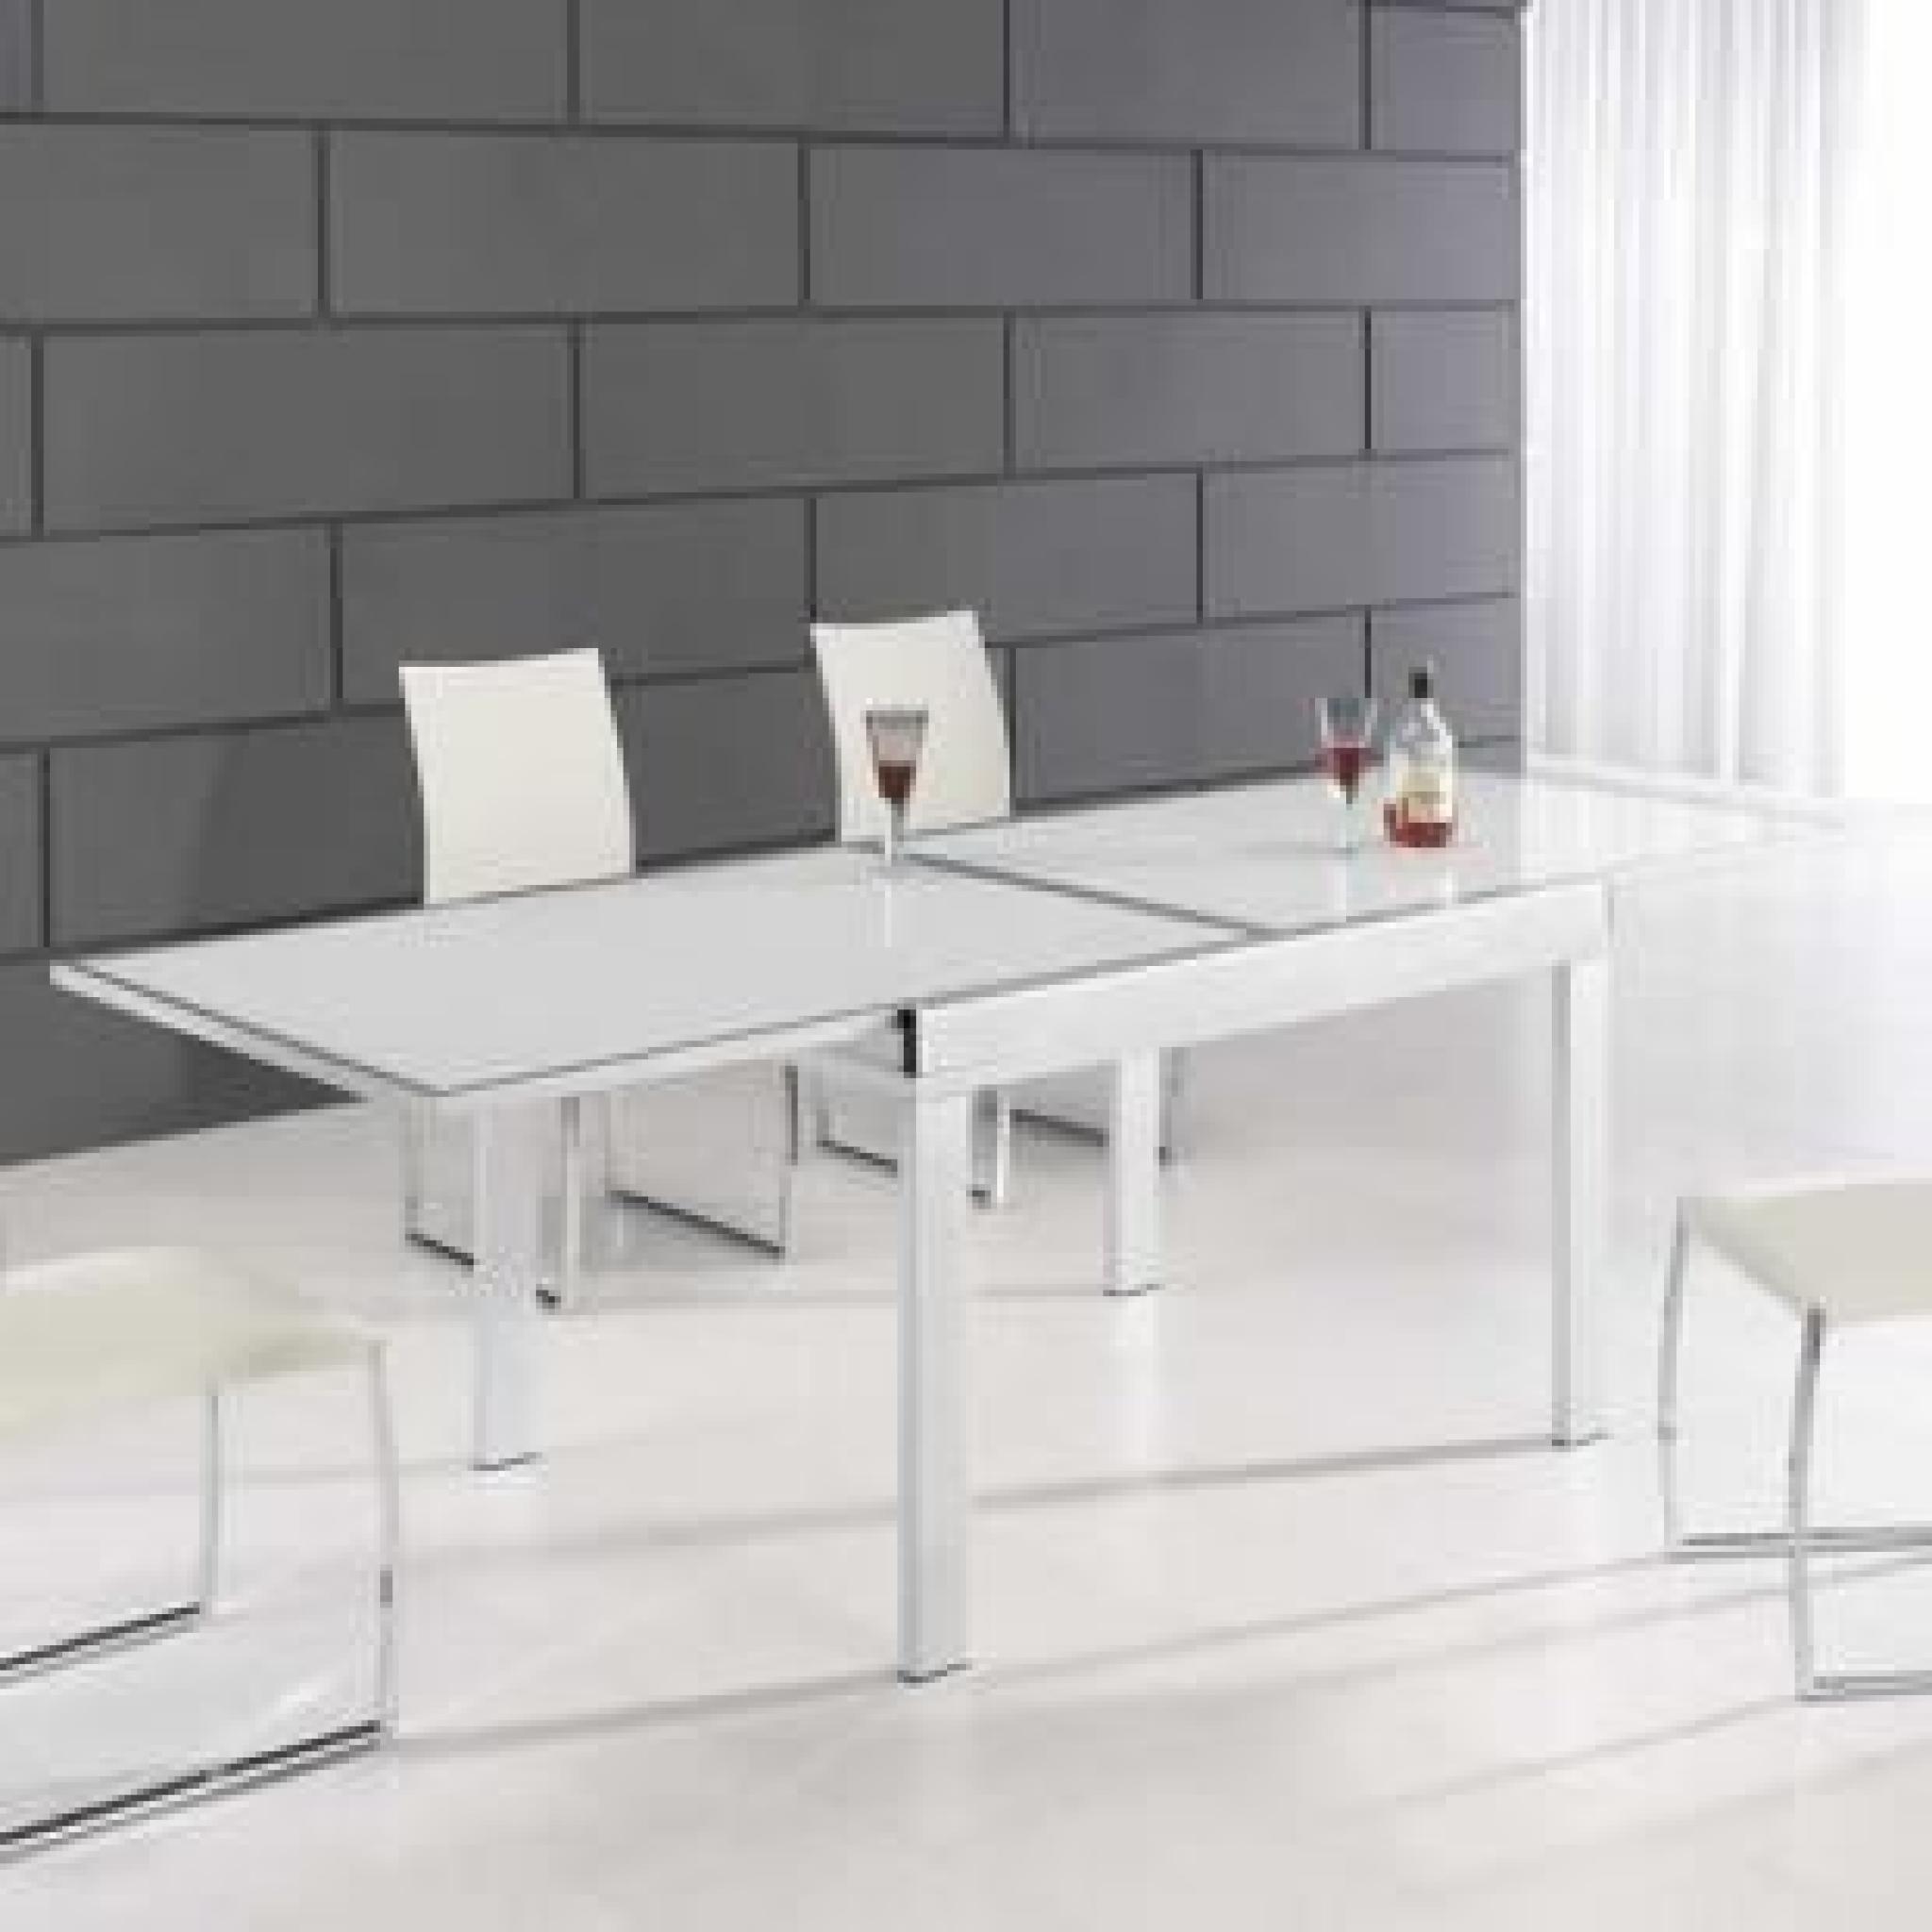 Table En Verre Extensible Blanche Manhattan dedans Table Salle A Manger Extensible Fly